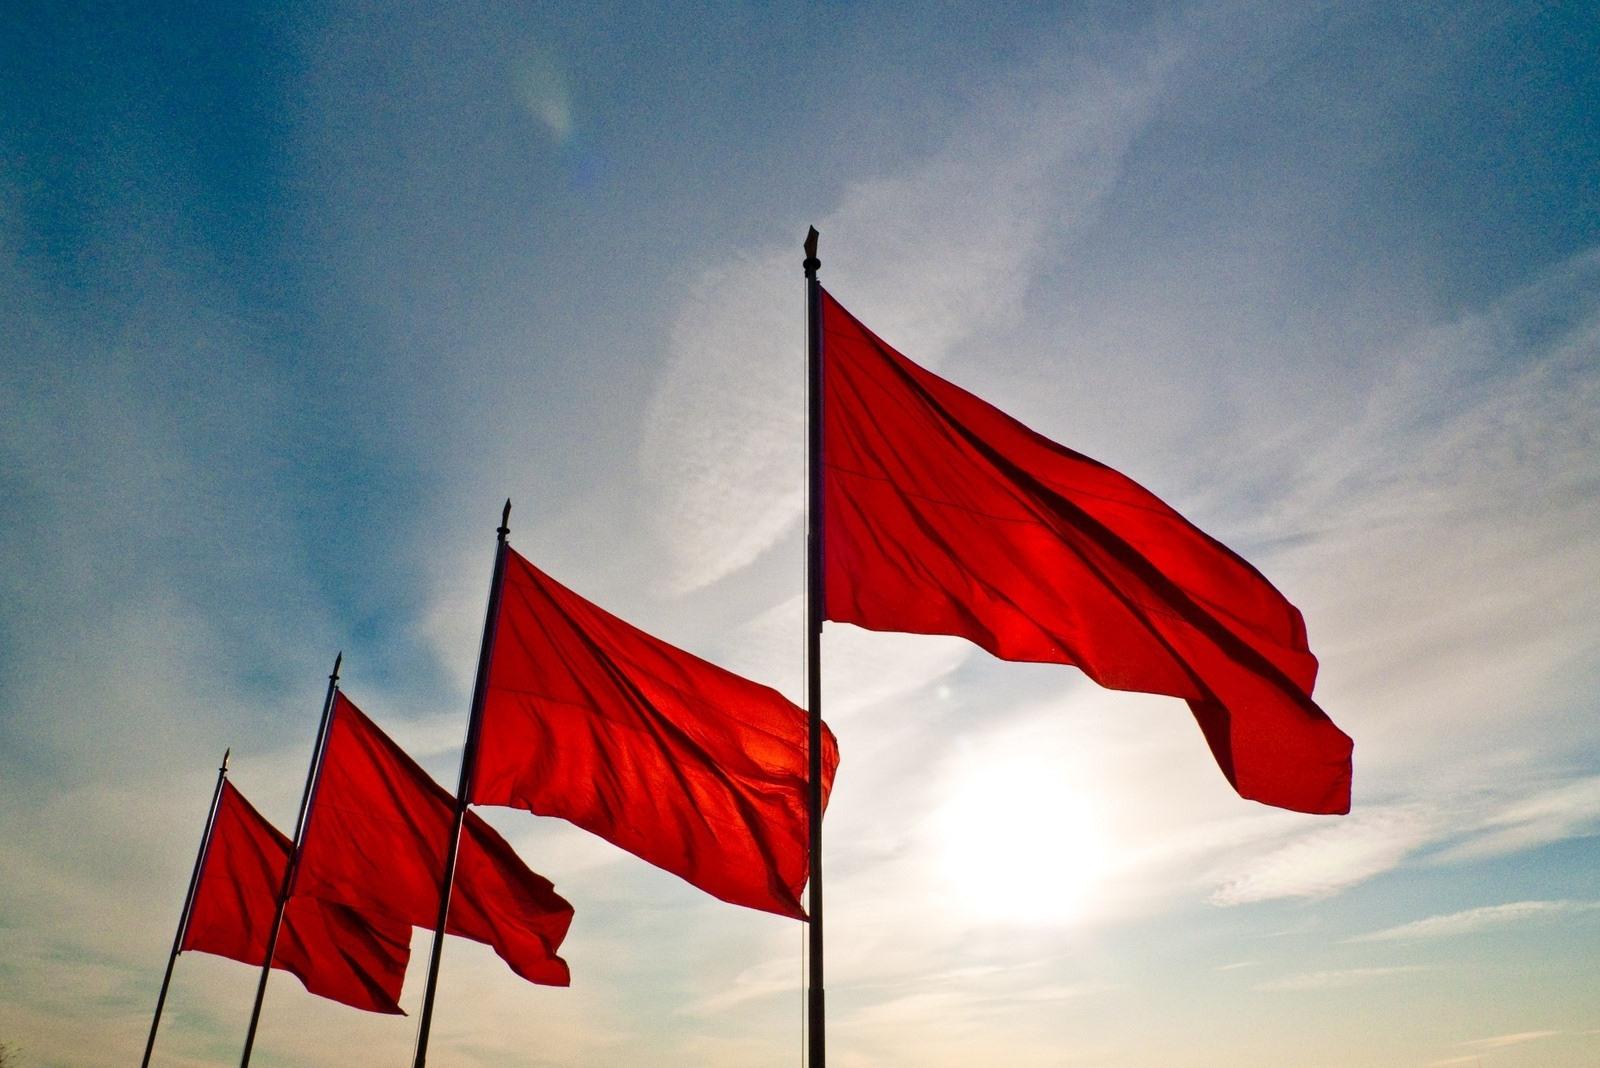 Bandera_roja.jpg